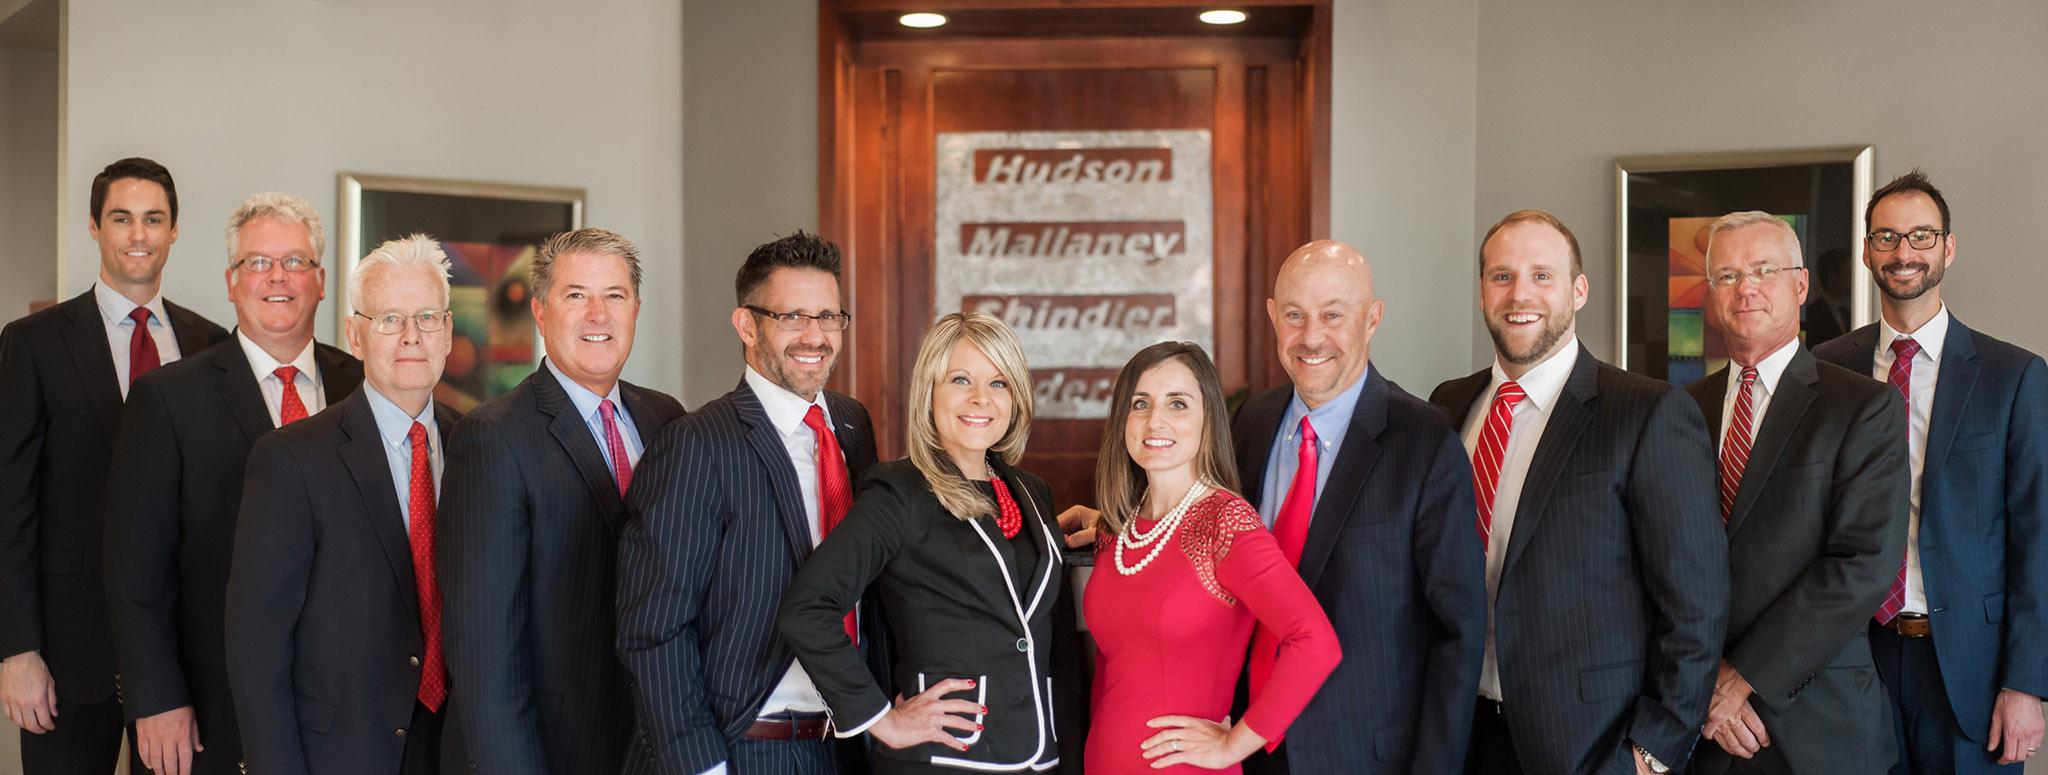 Hudson, Mallaney, Shindler & Anderson, P.C.